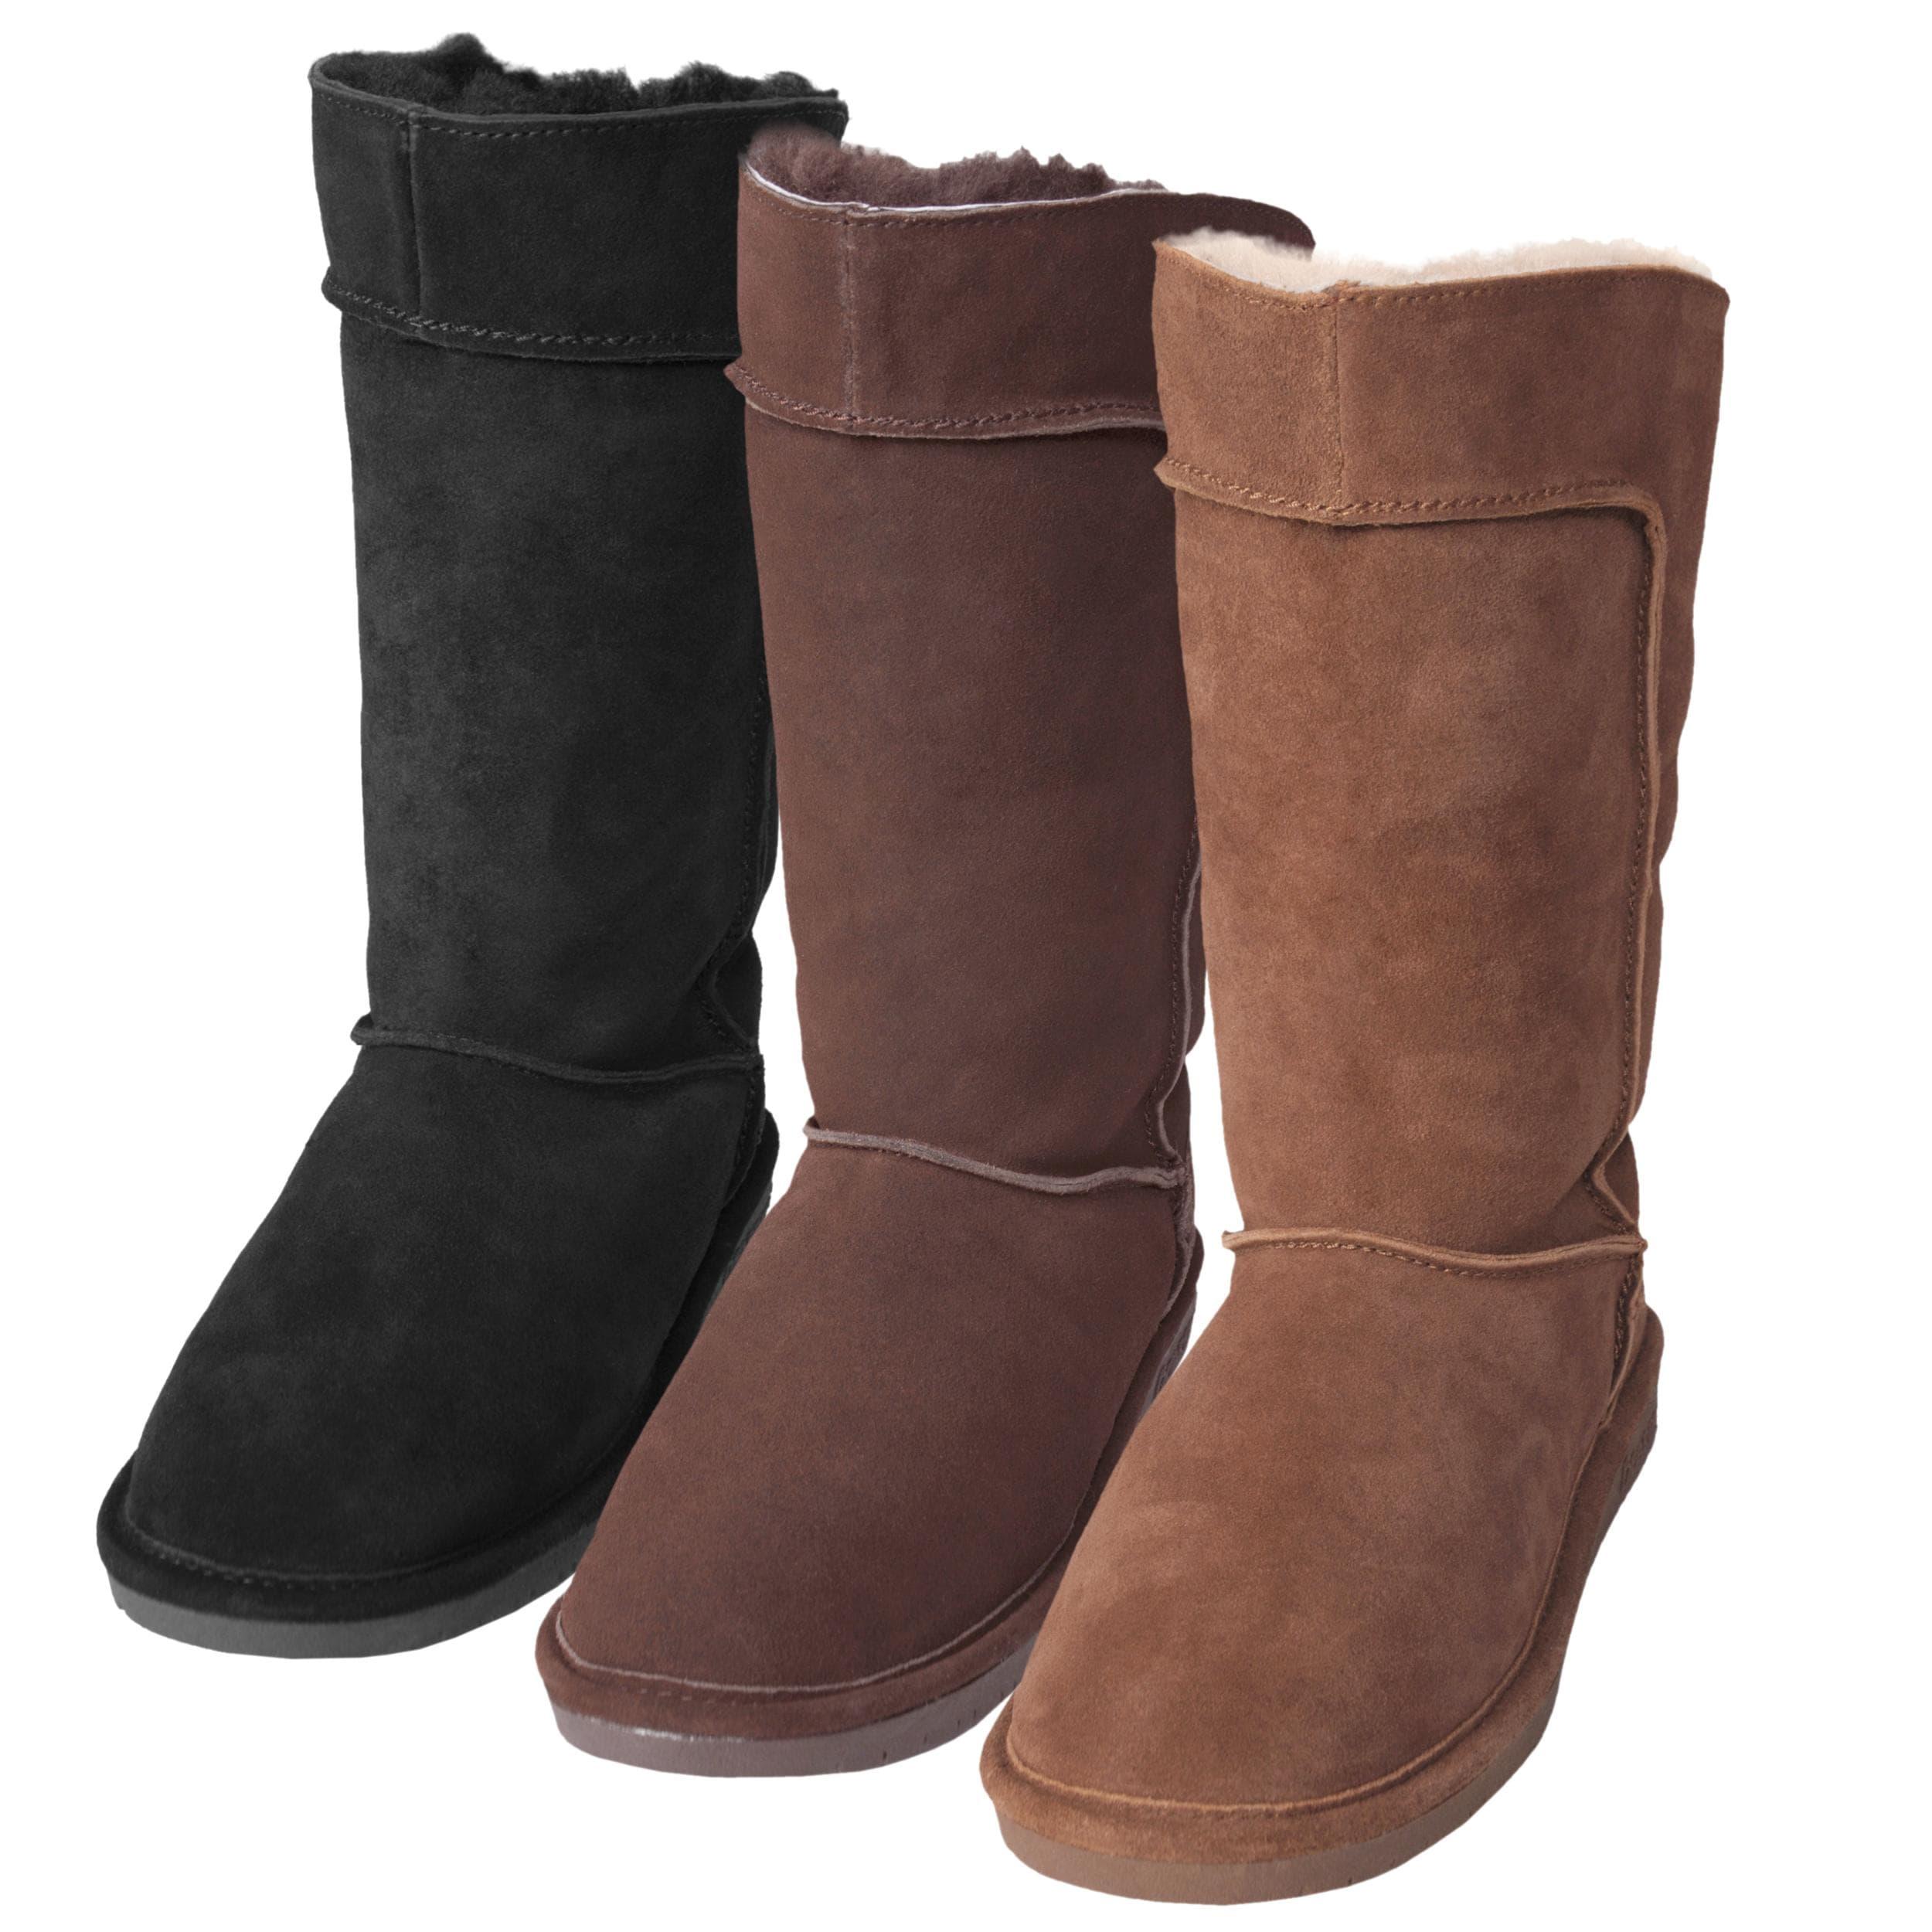 Bearpaw Women's 'Hayden' Suede Sheepskin-lined Epaulet Detail Boots